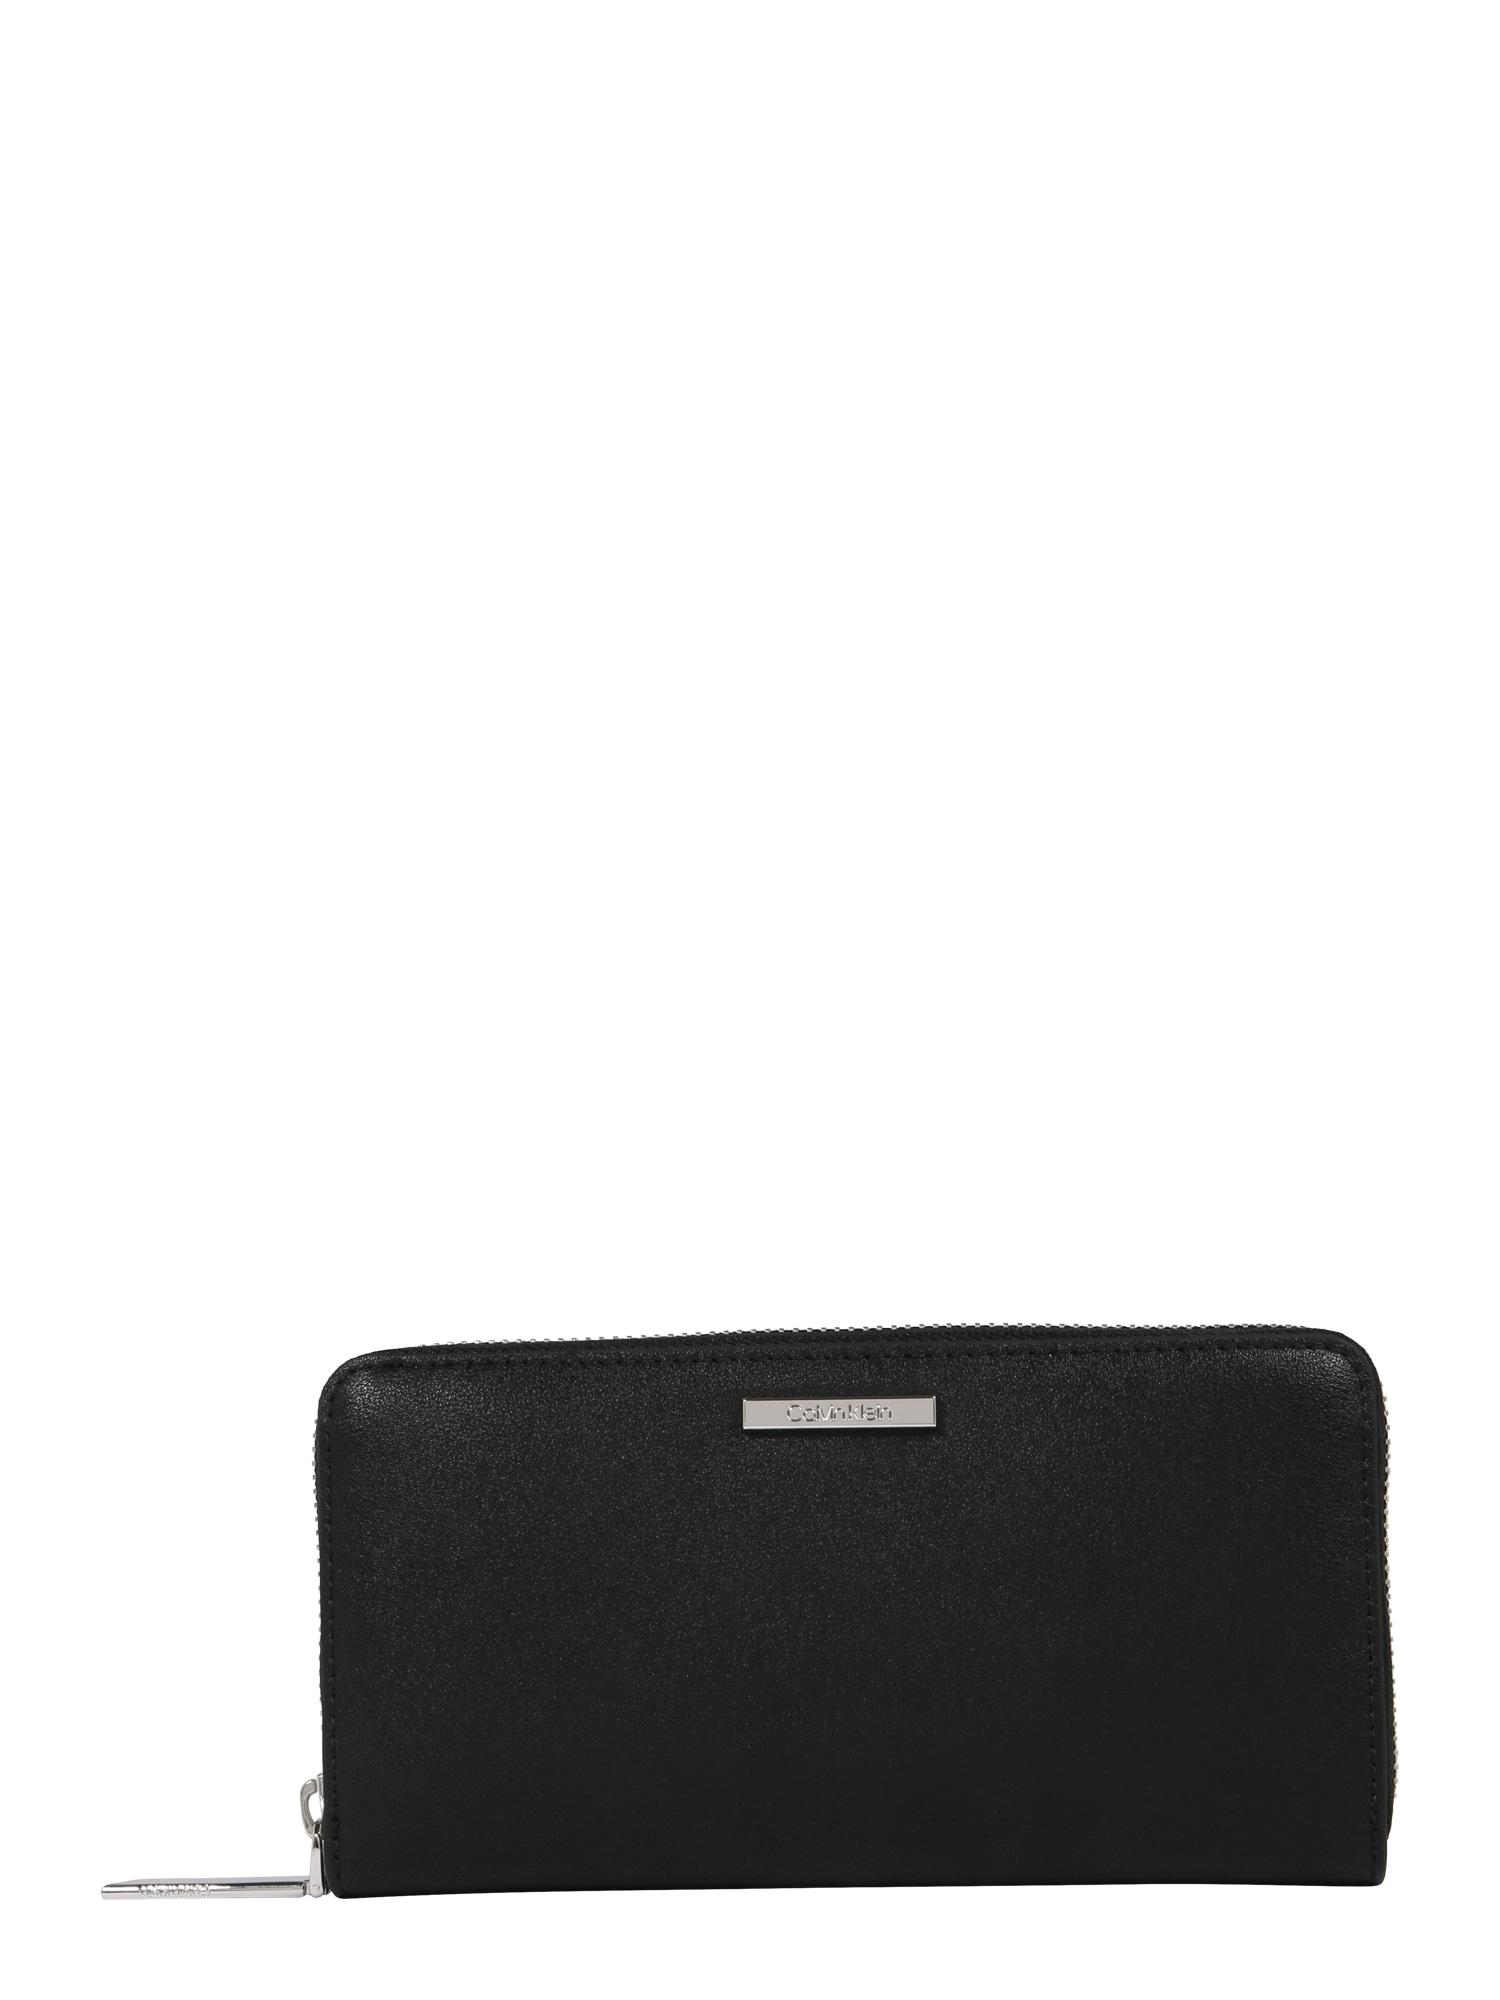 Peněženka EXTENDED LRG ZIPAROUND černá Calvin Klein